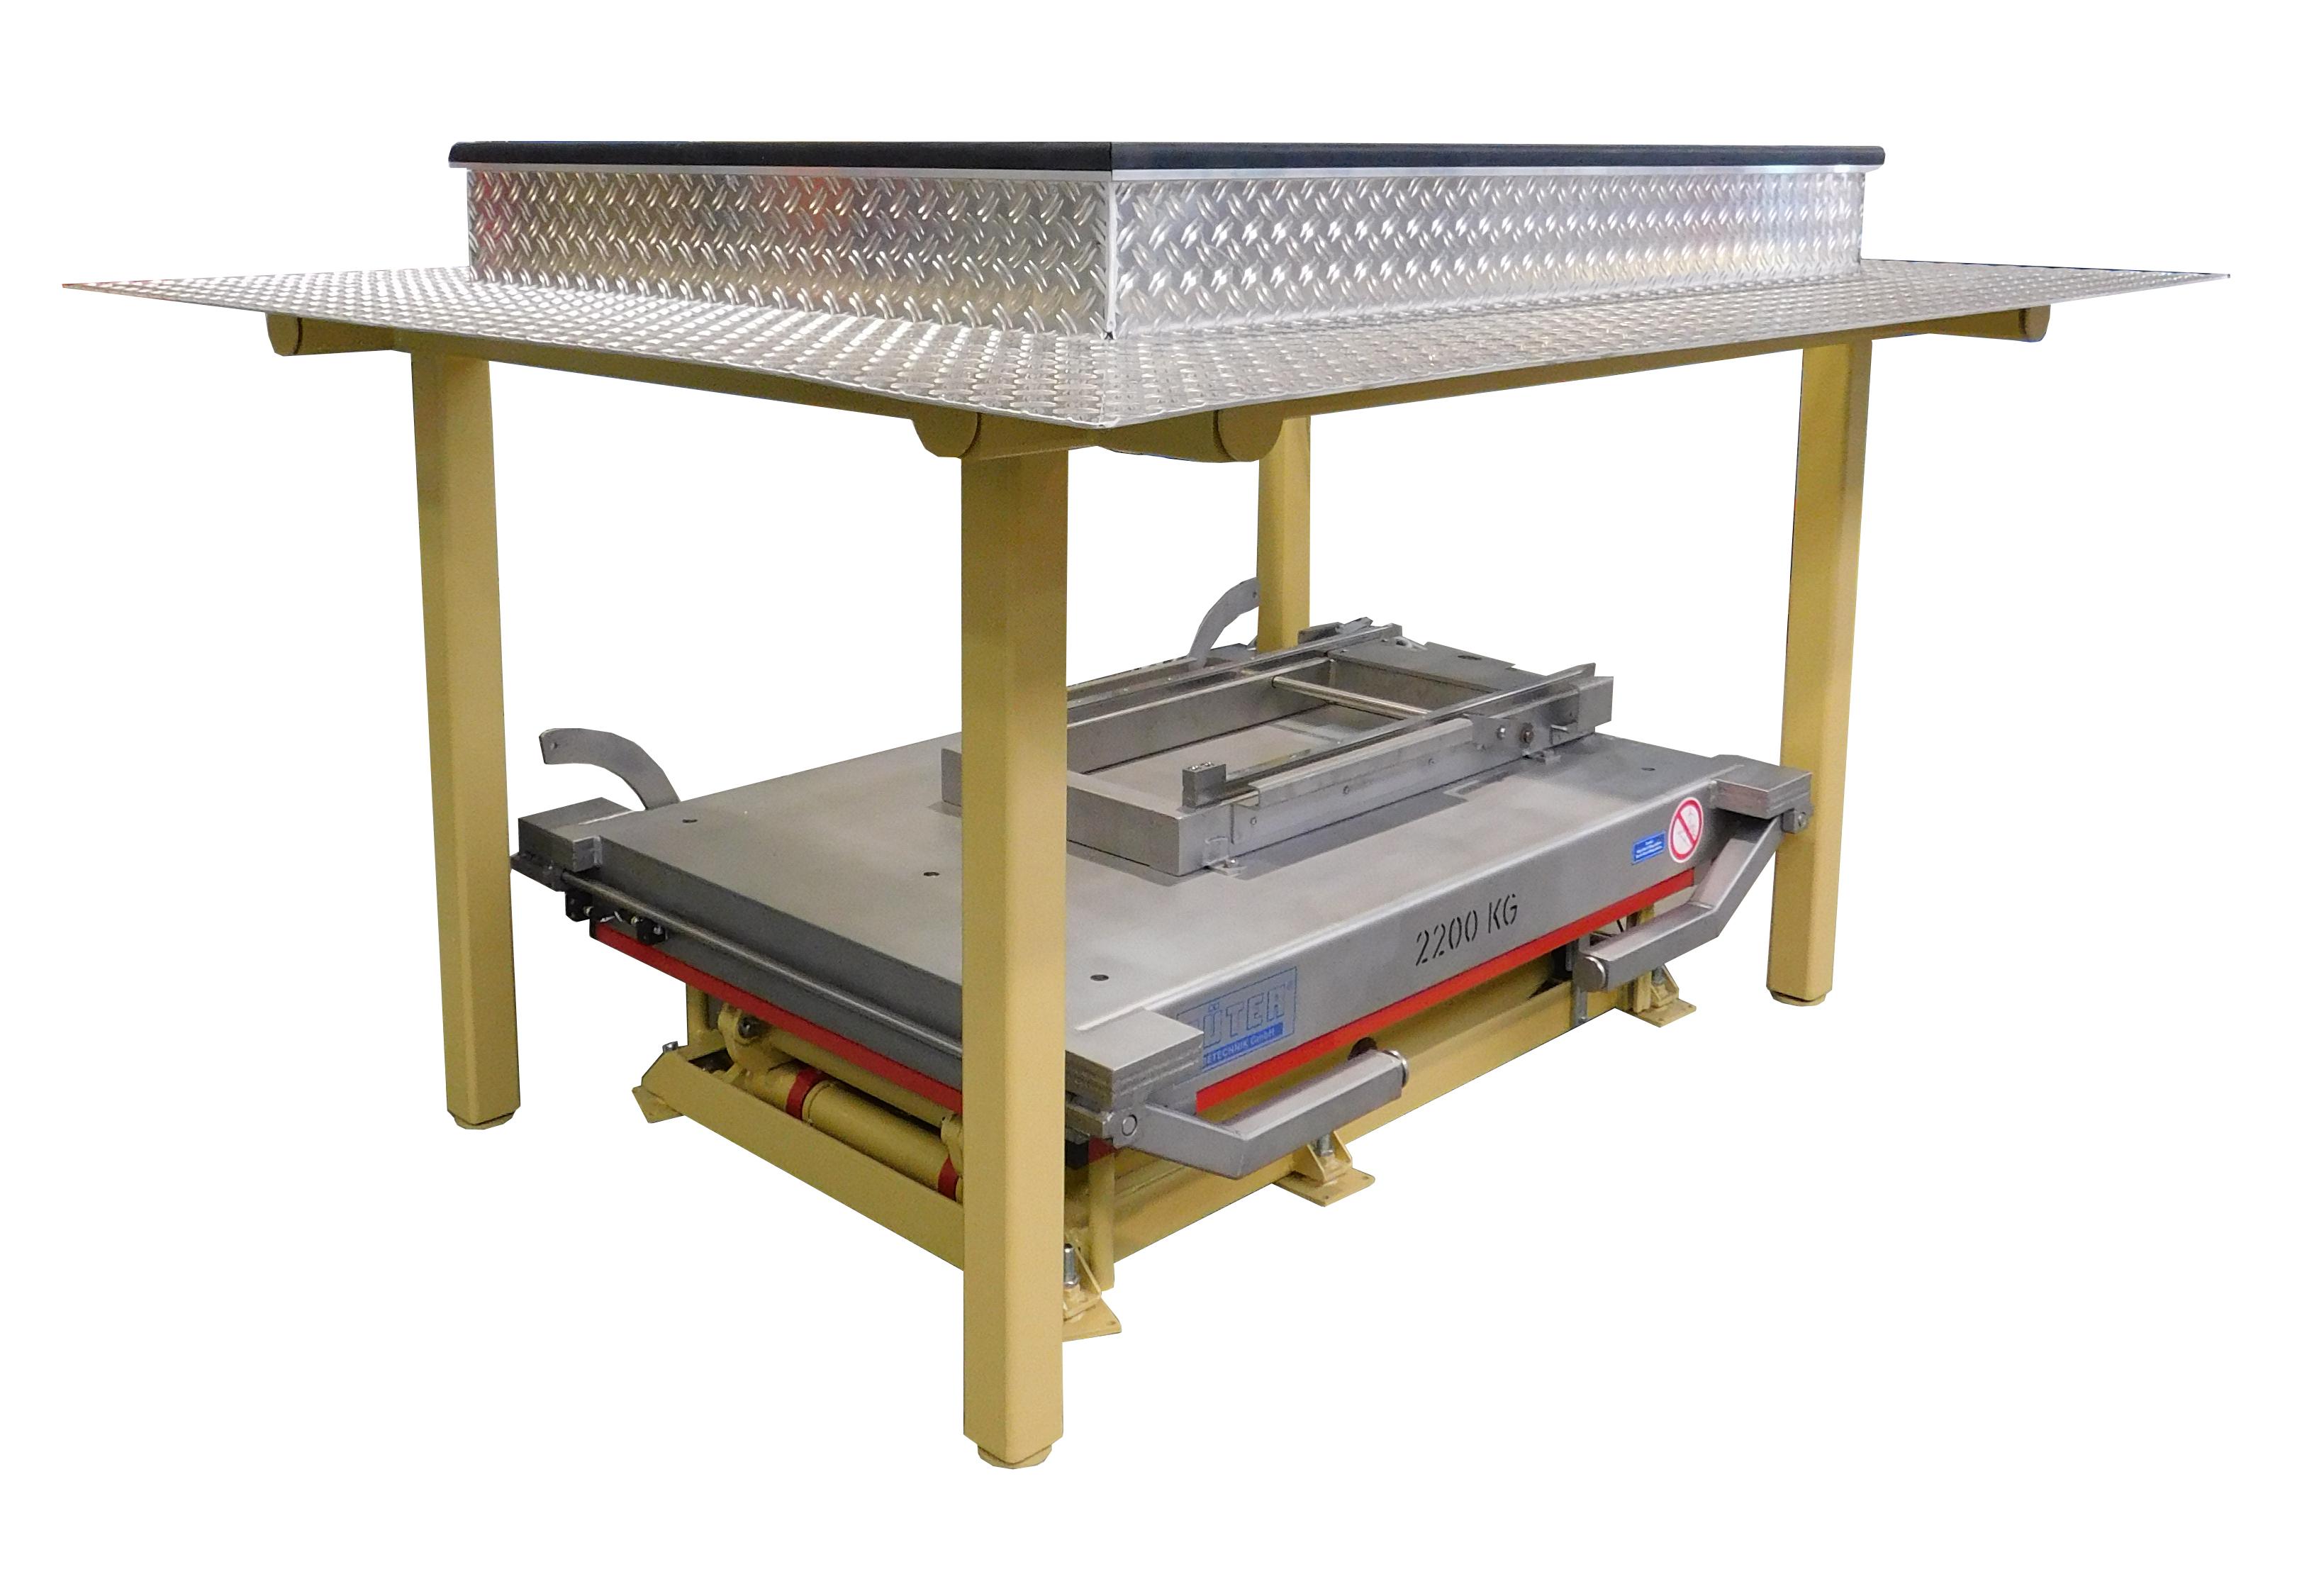 Foto Lifting tafel met transportband technologie ingetrokken